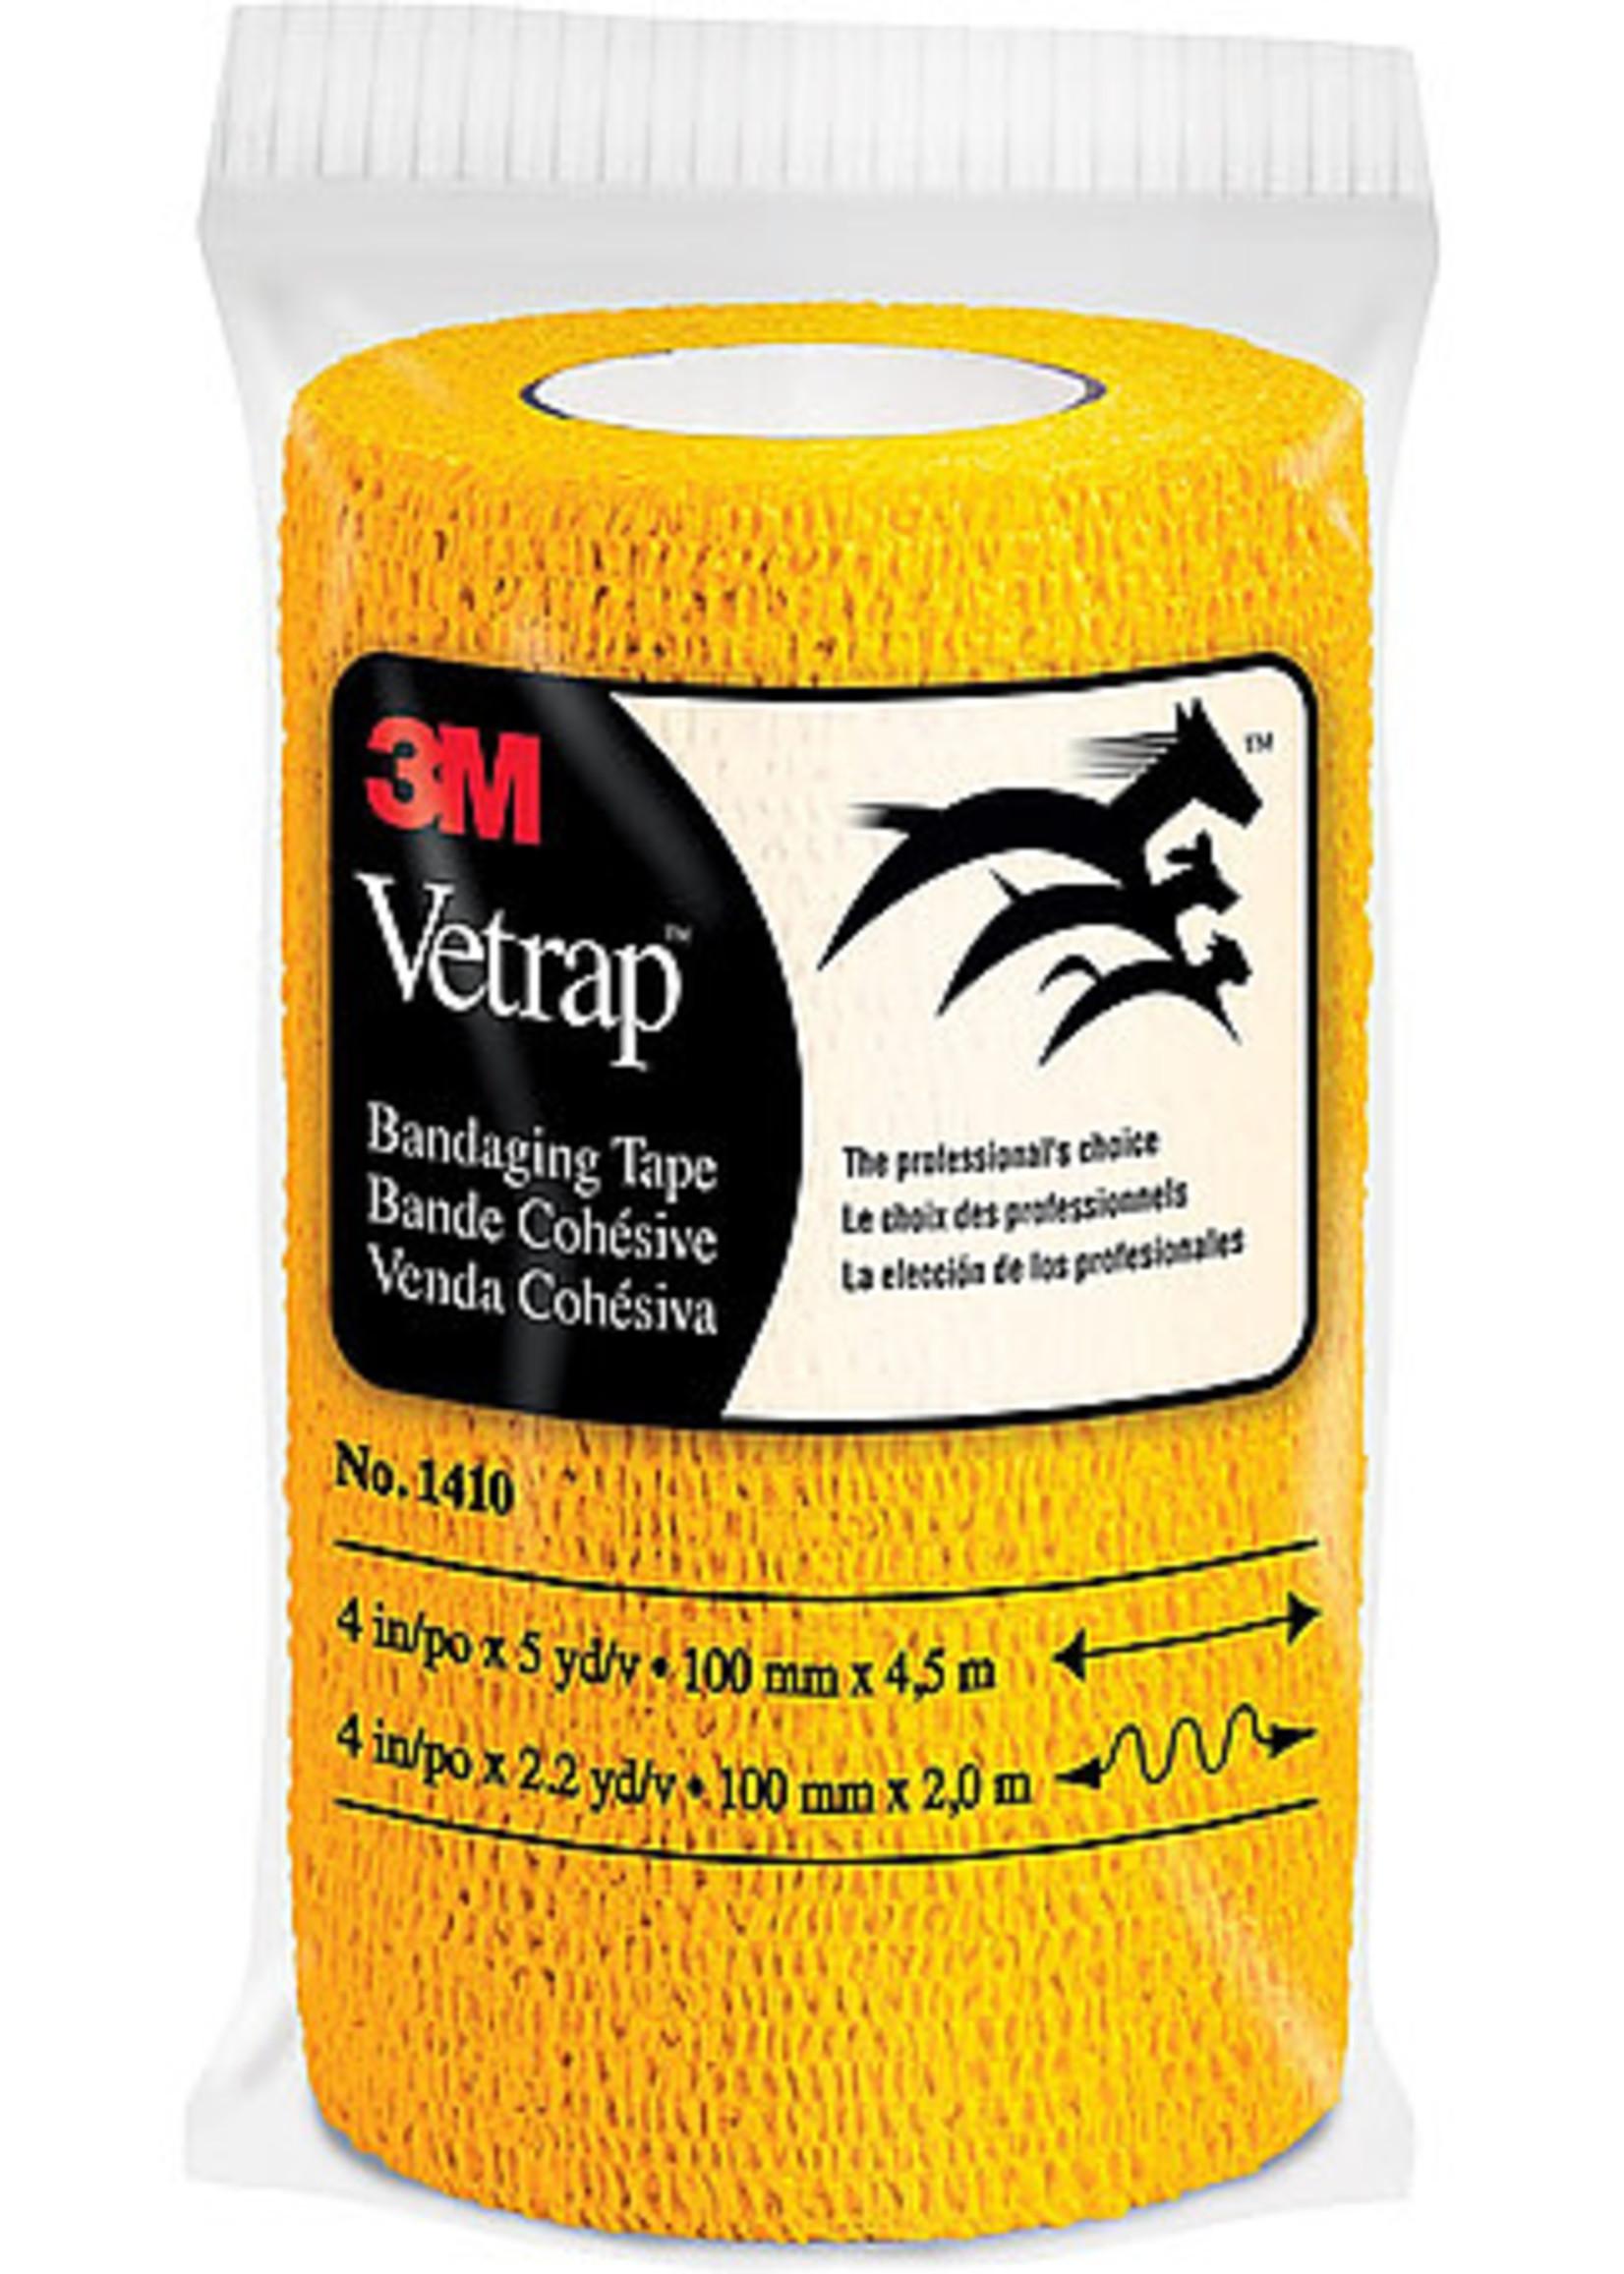 "3M 3M Vetrap Bandaging Tape Gold 4""X15'"